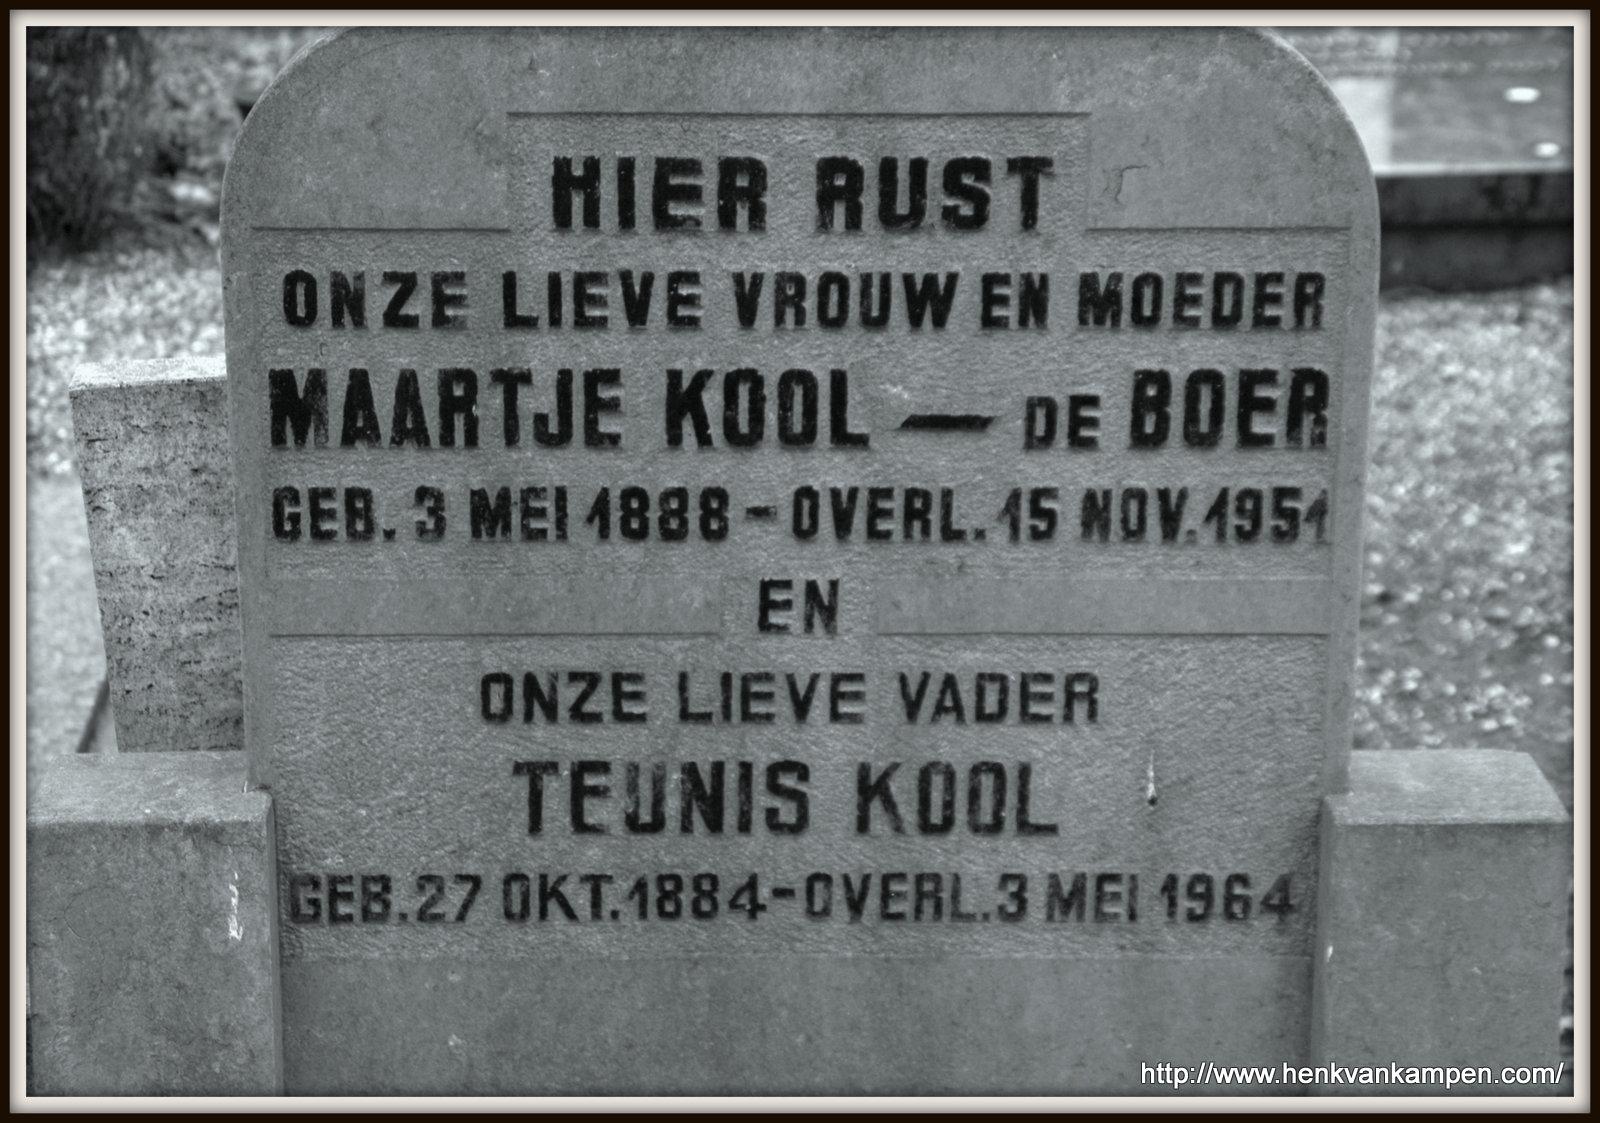 Kool - de Boer tombstone, Kerkveld cemetery, Nieuwegein